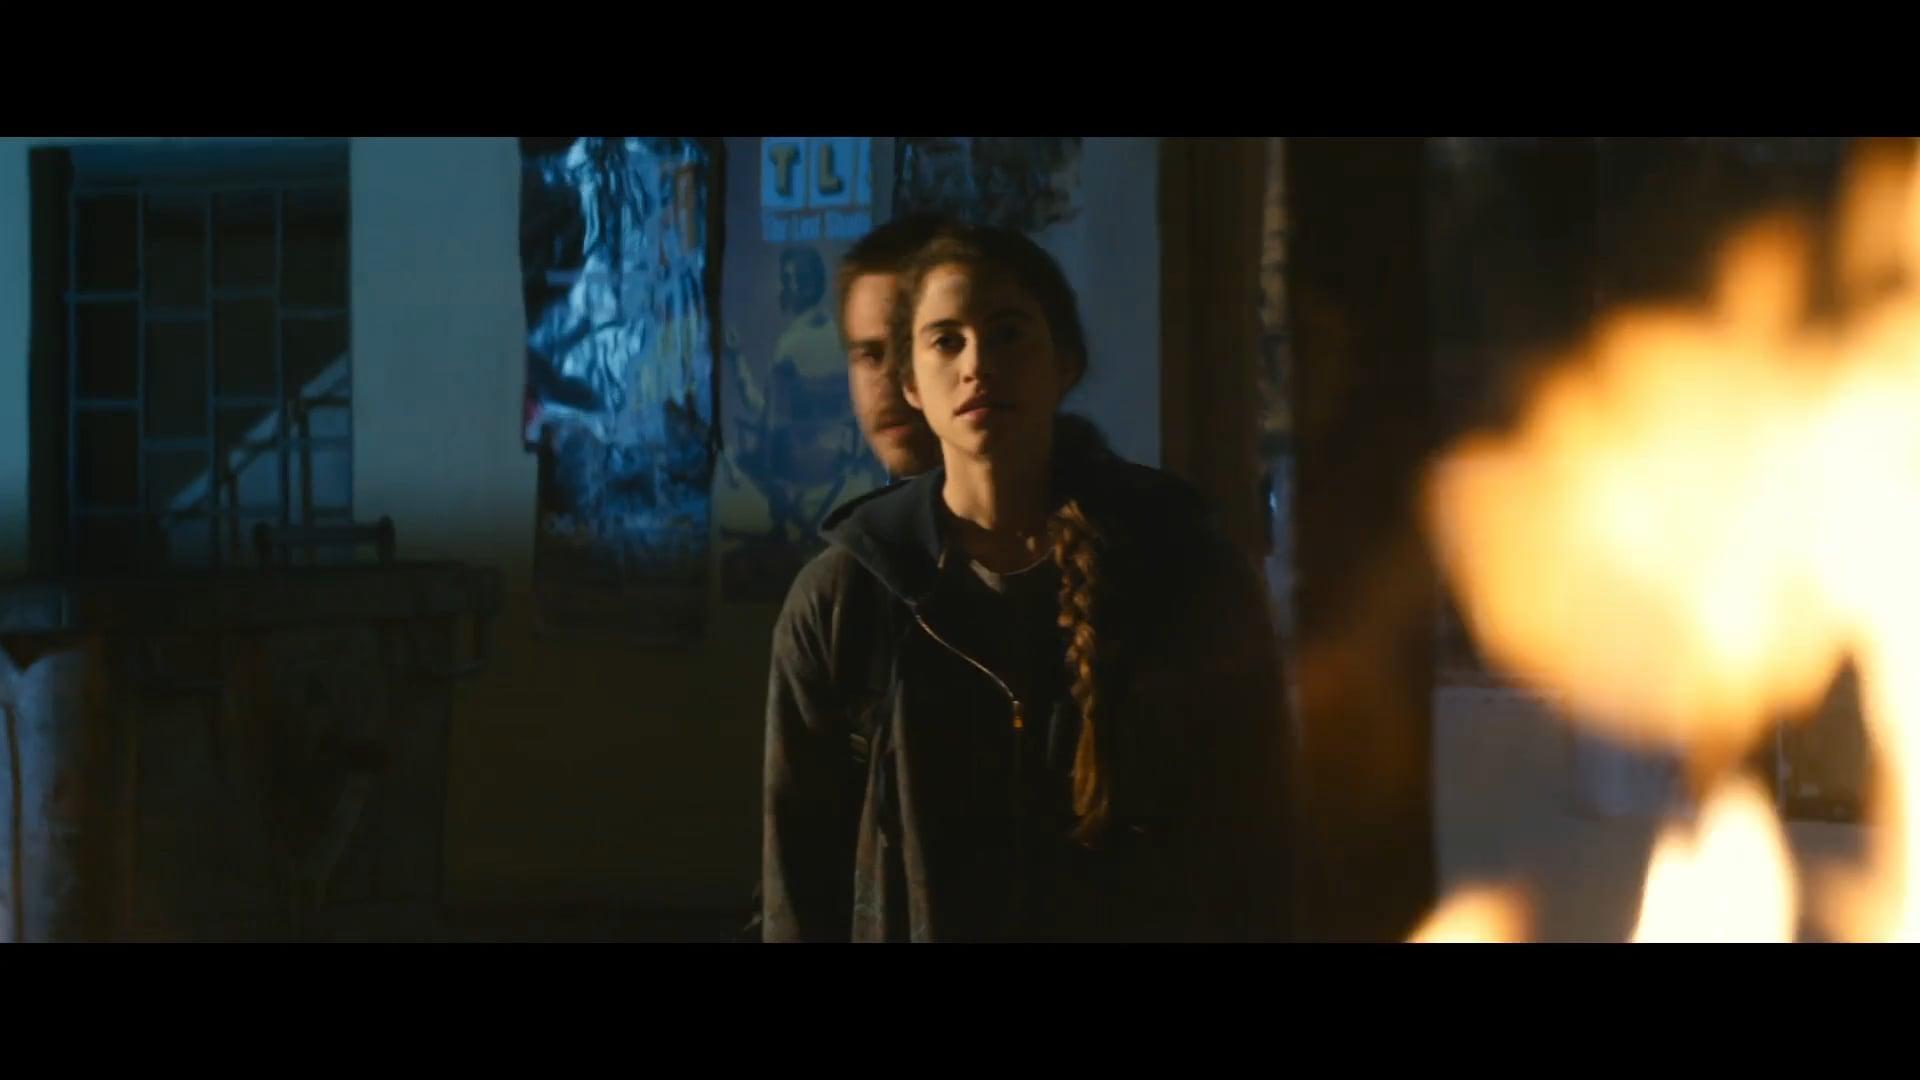 Happy Birthday movie Trailer - directed by Christos Georgiou